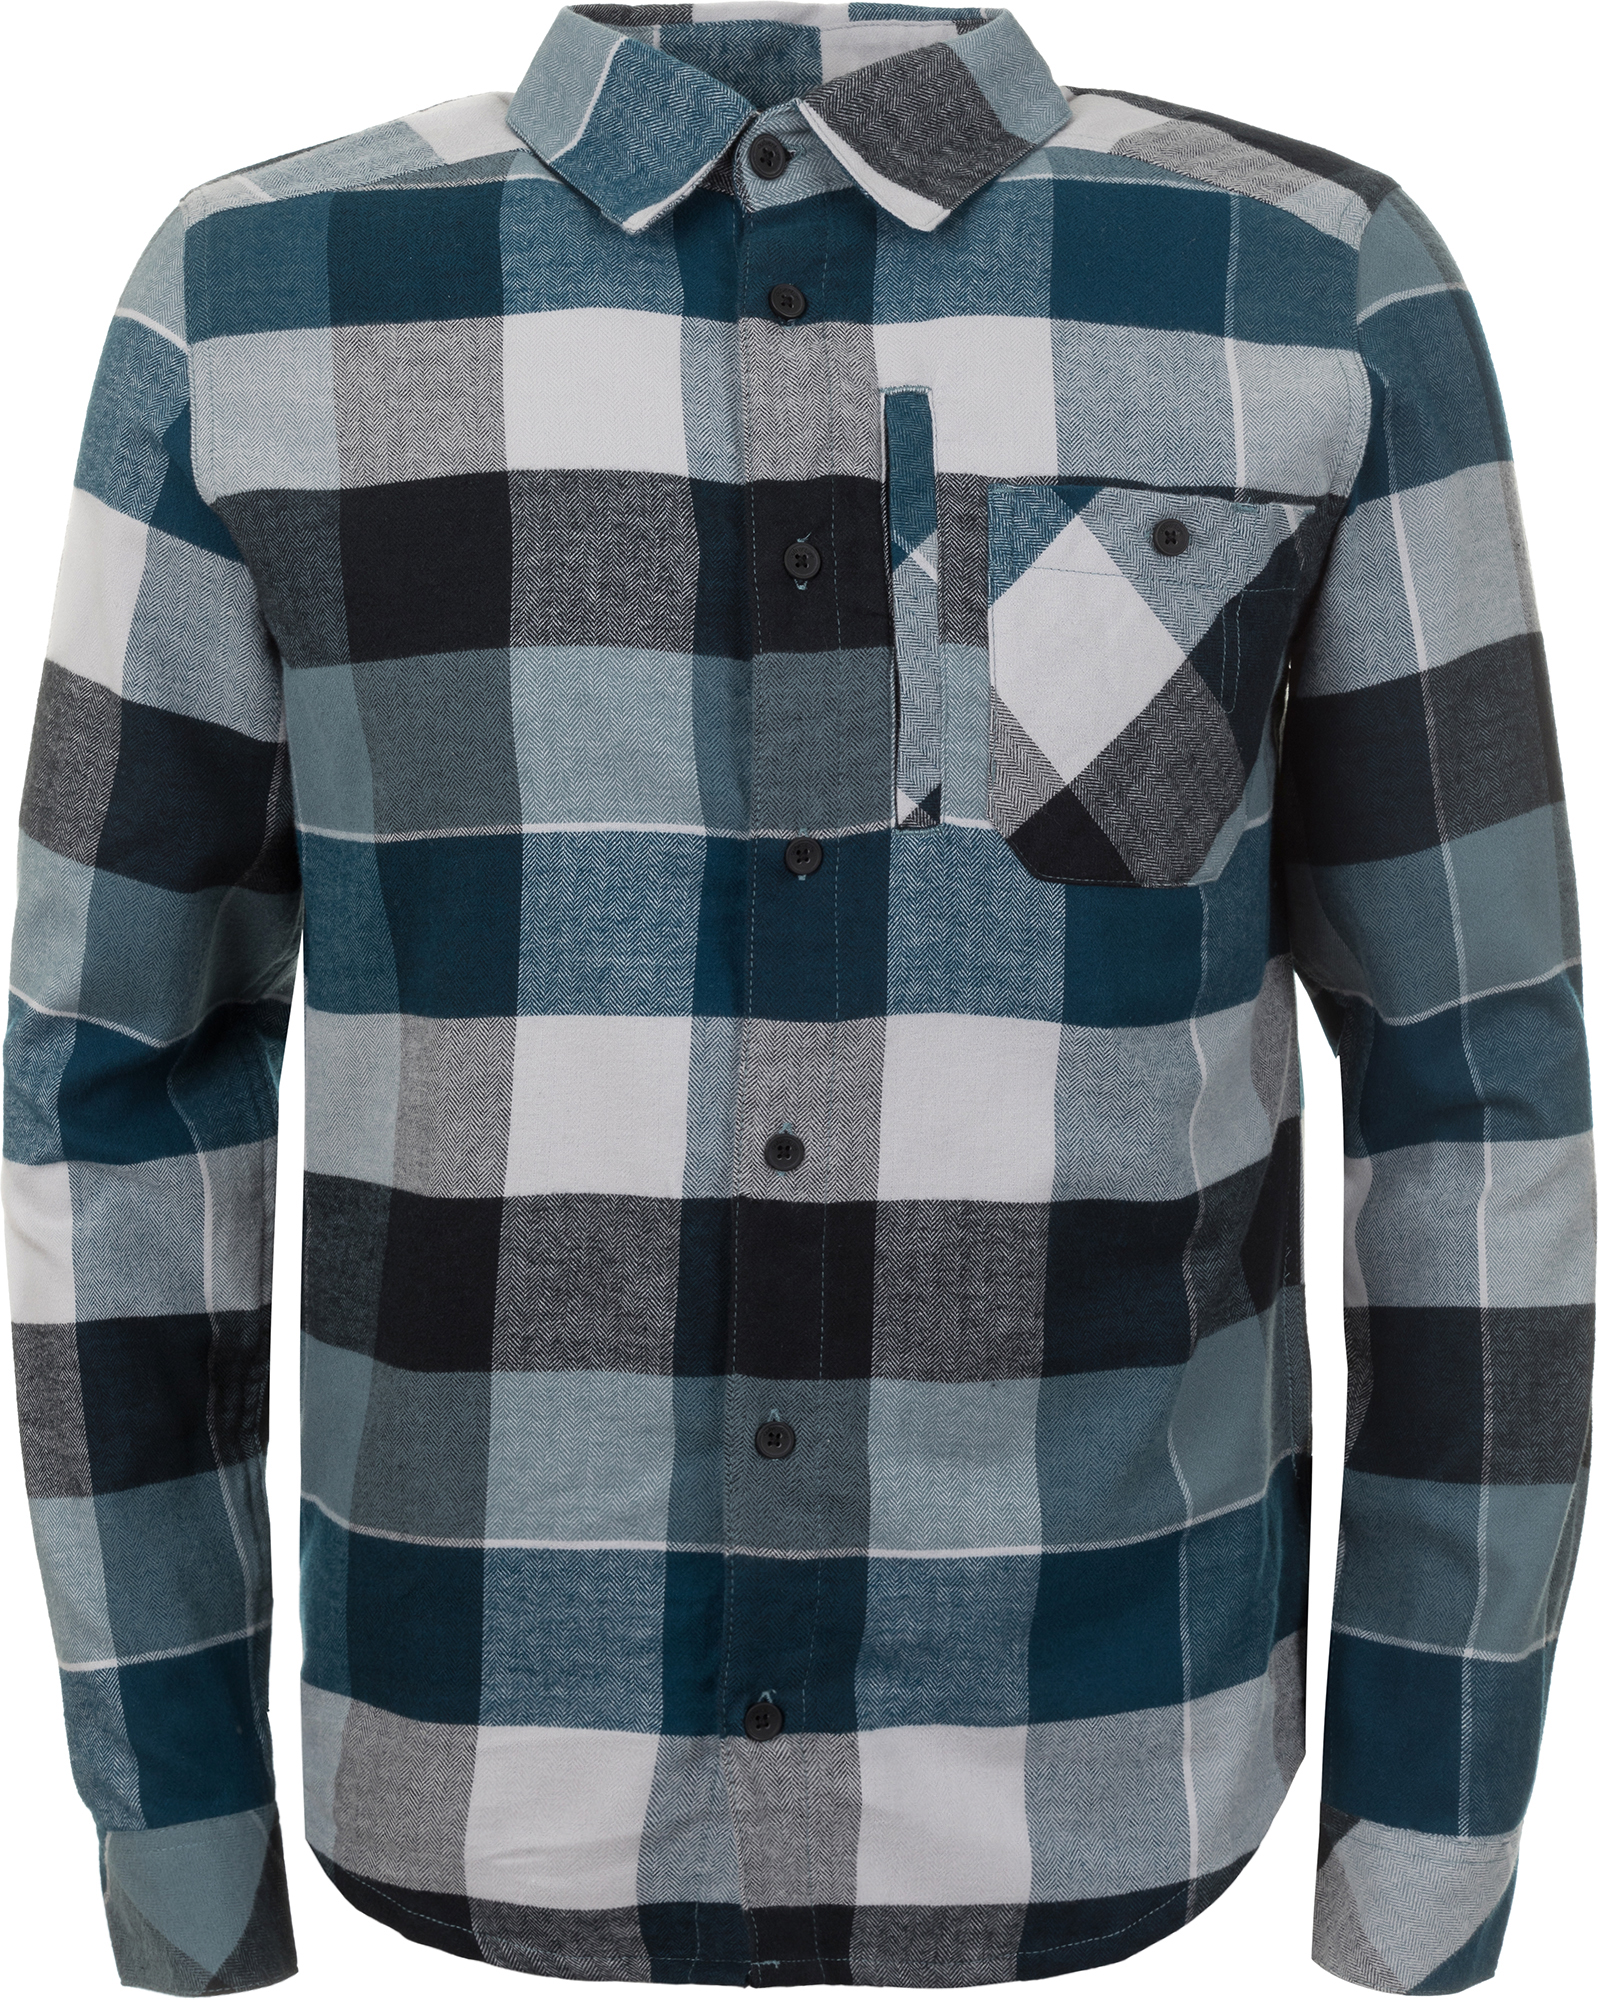 Outventure Рубашка с длинным рукавом мужская Outventure, размер 62